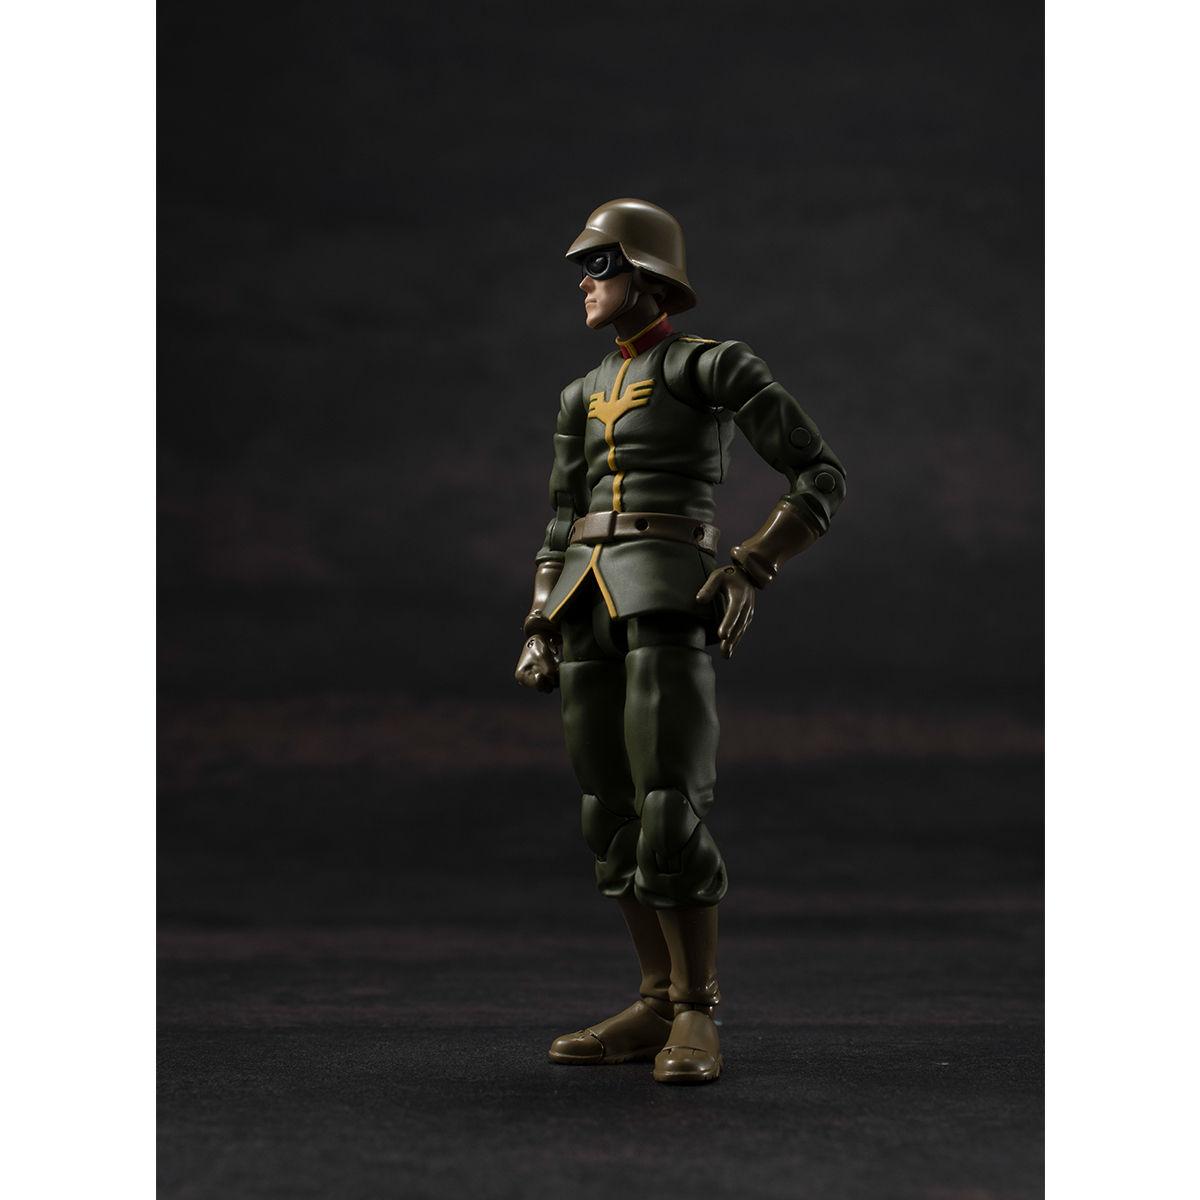 G.M.G. ガンダムミリタリージェネレーション『ジオン公国軍一般兵士01』1/18 可動フィギュア-002